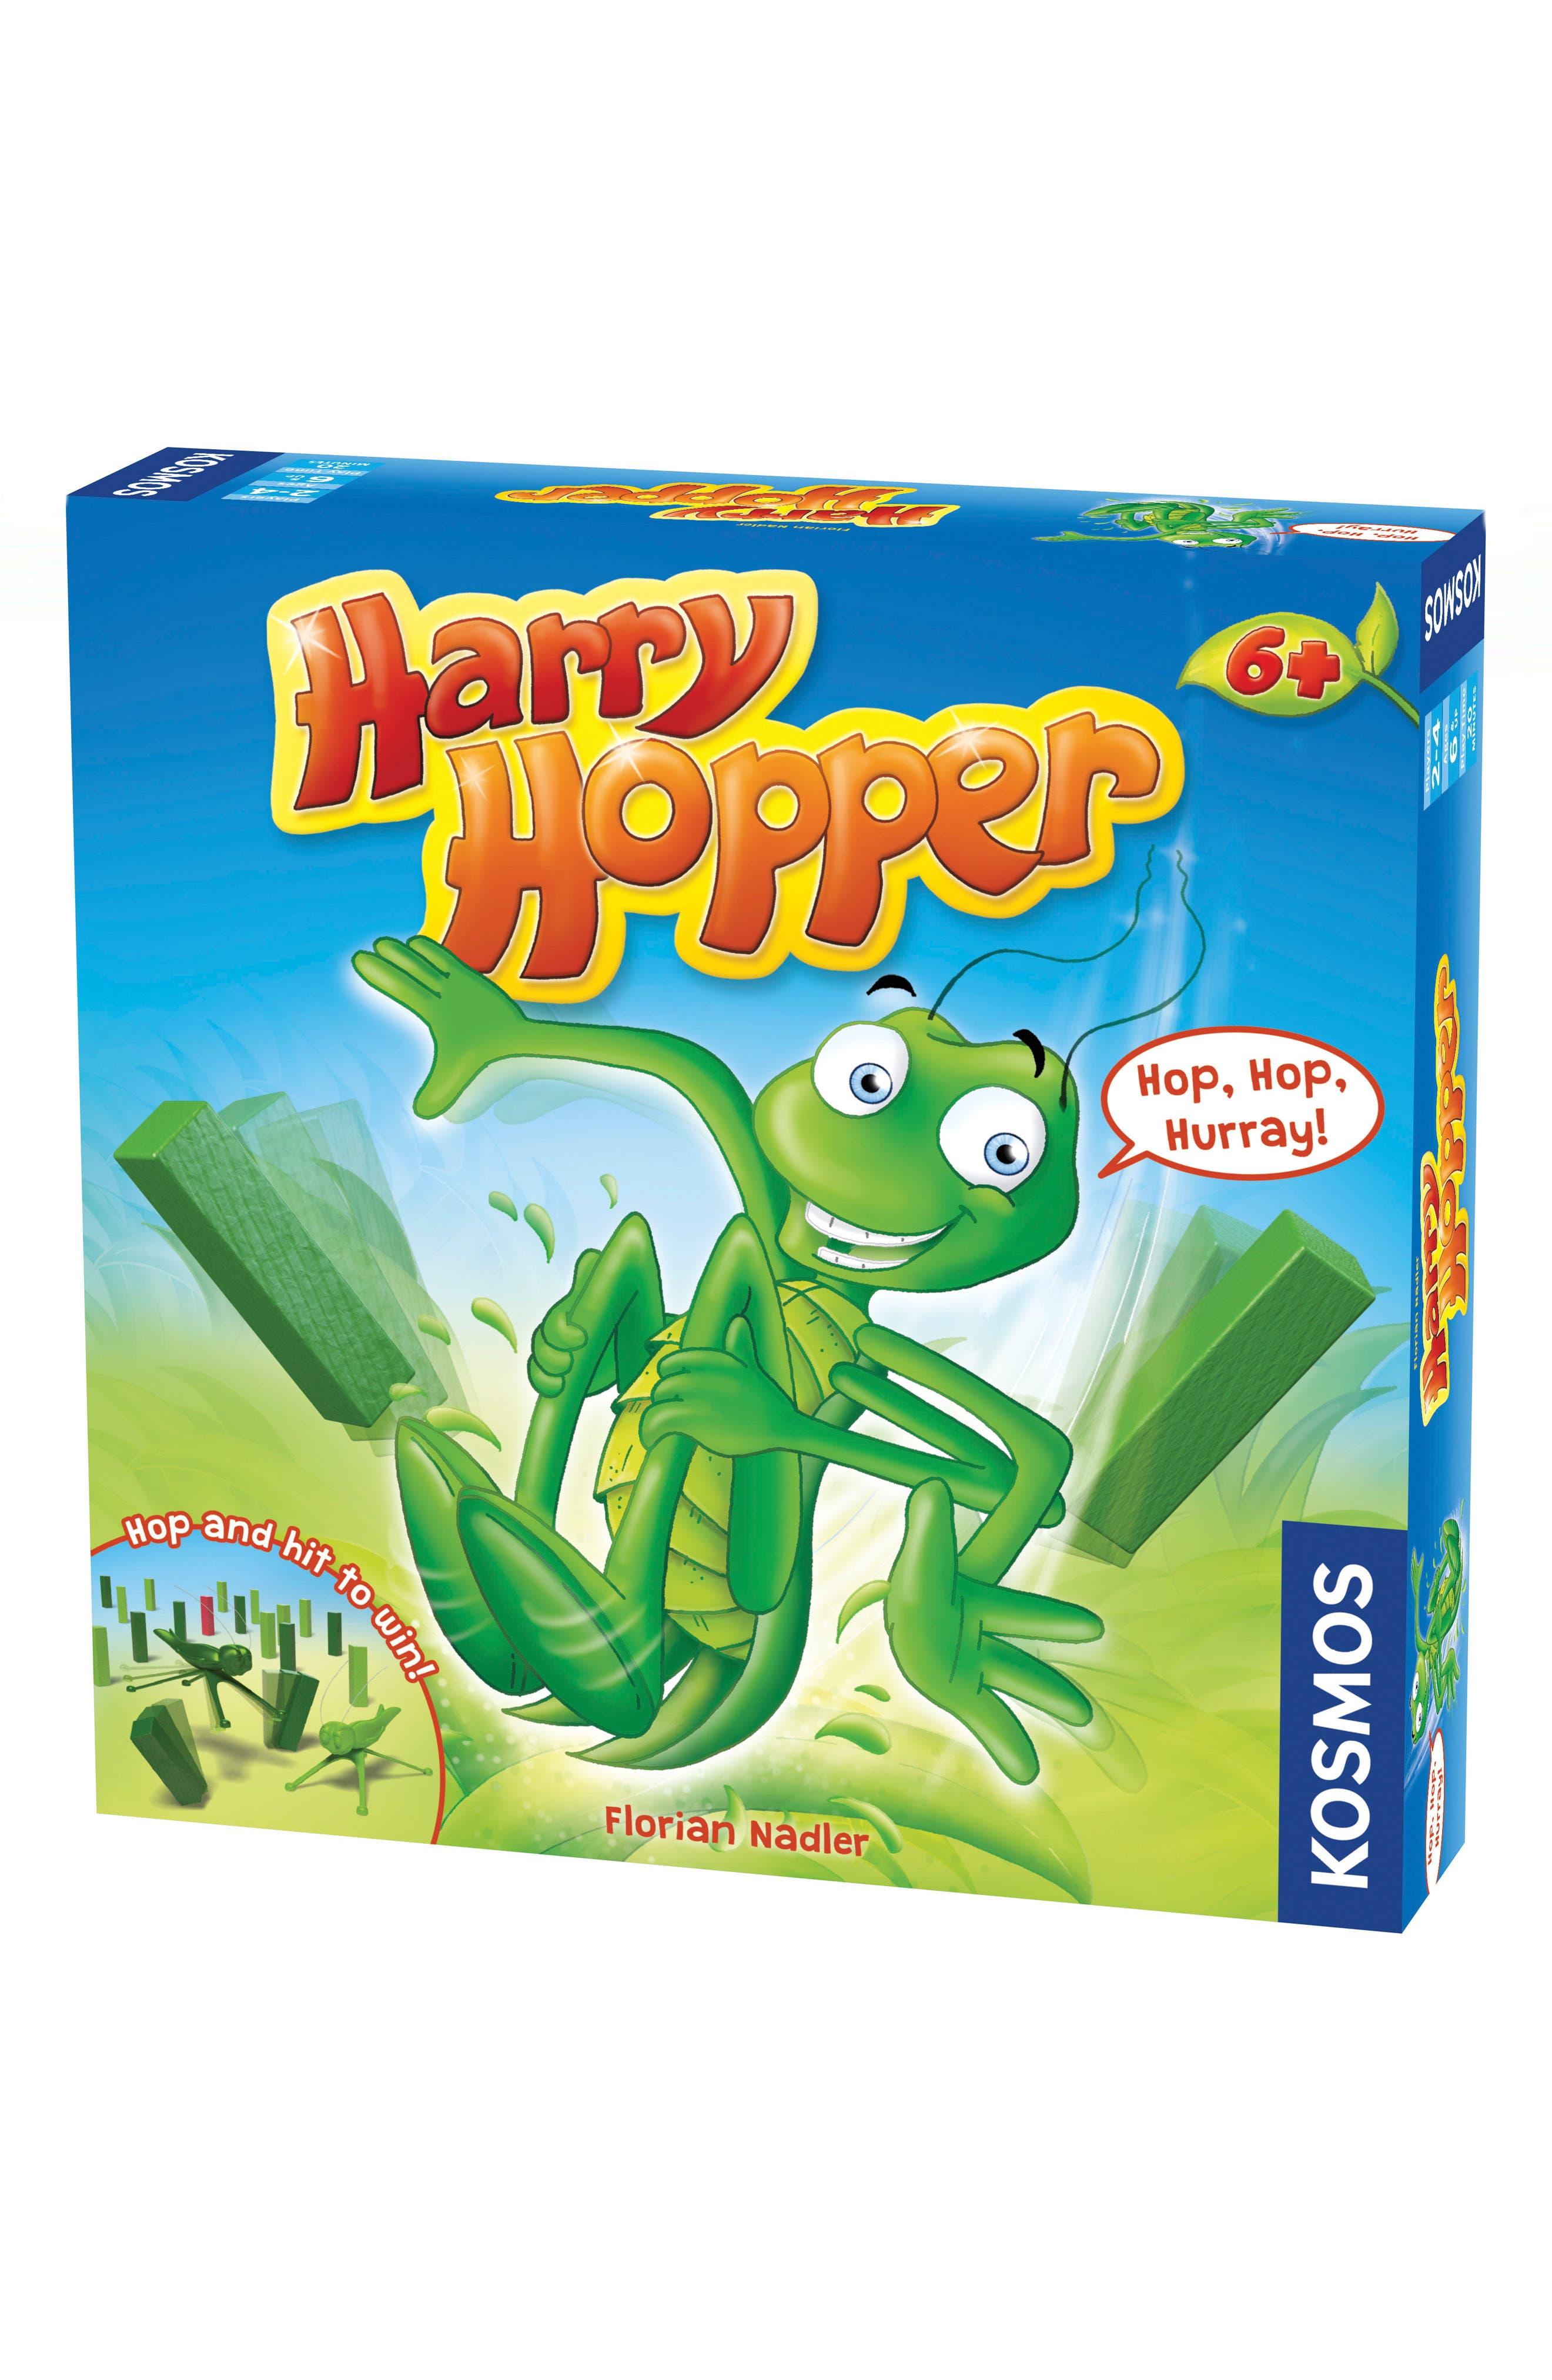 Thames & Kosmos Harry Hopper Game